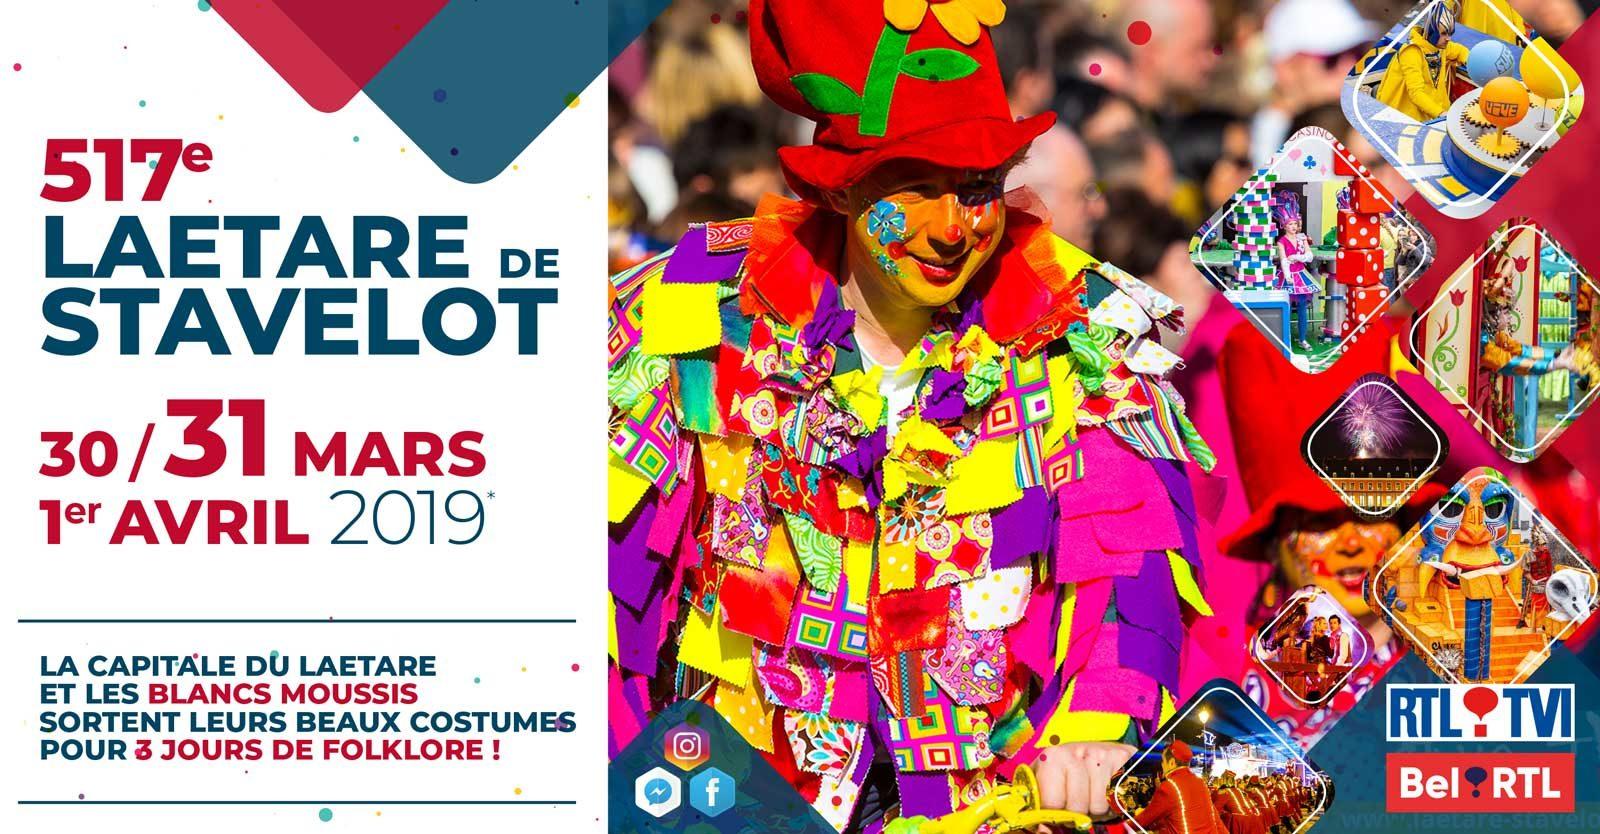 Laetare-Stavelot-2019-BandeauPourPubFacebook-v01-ordre-cortège-dimanche-lr